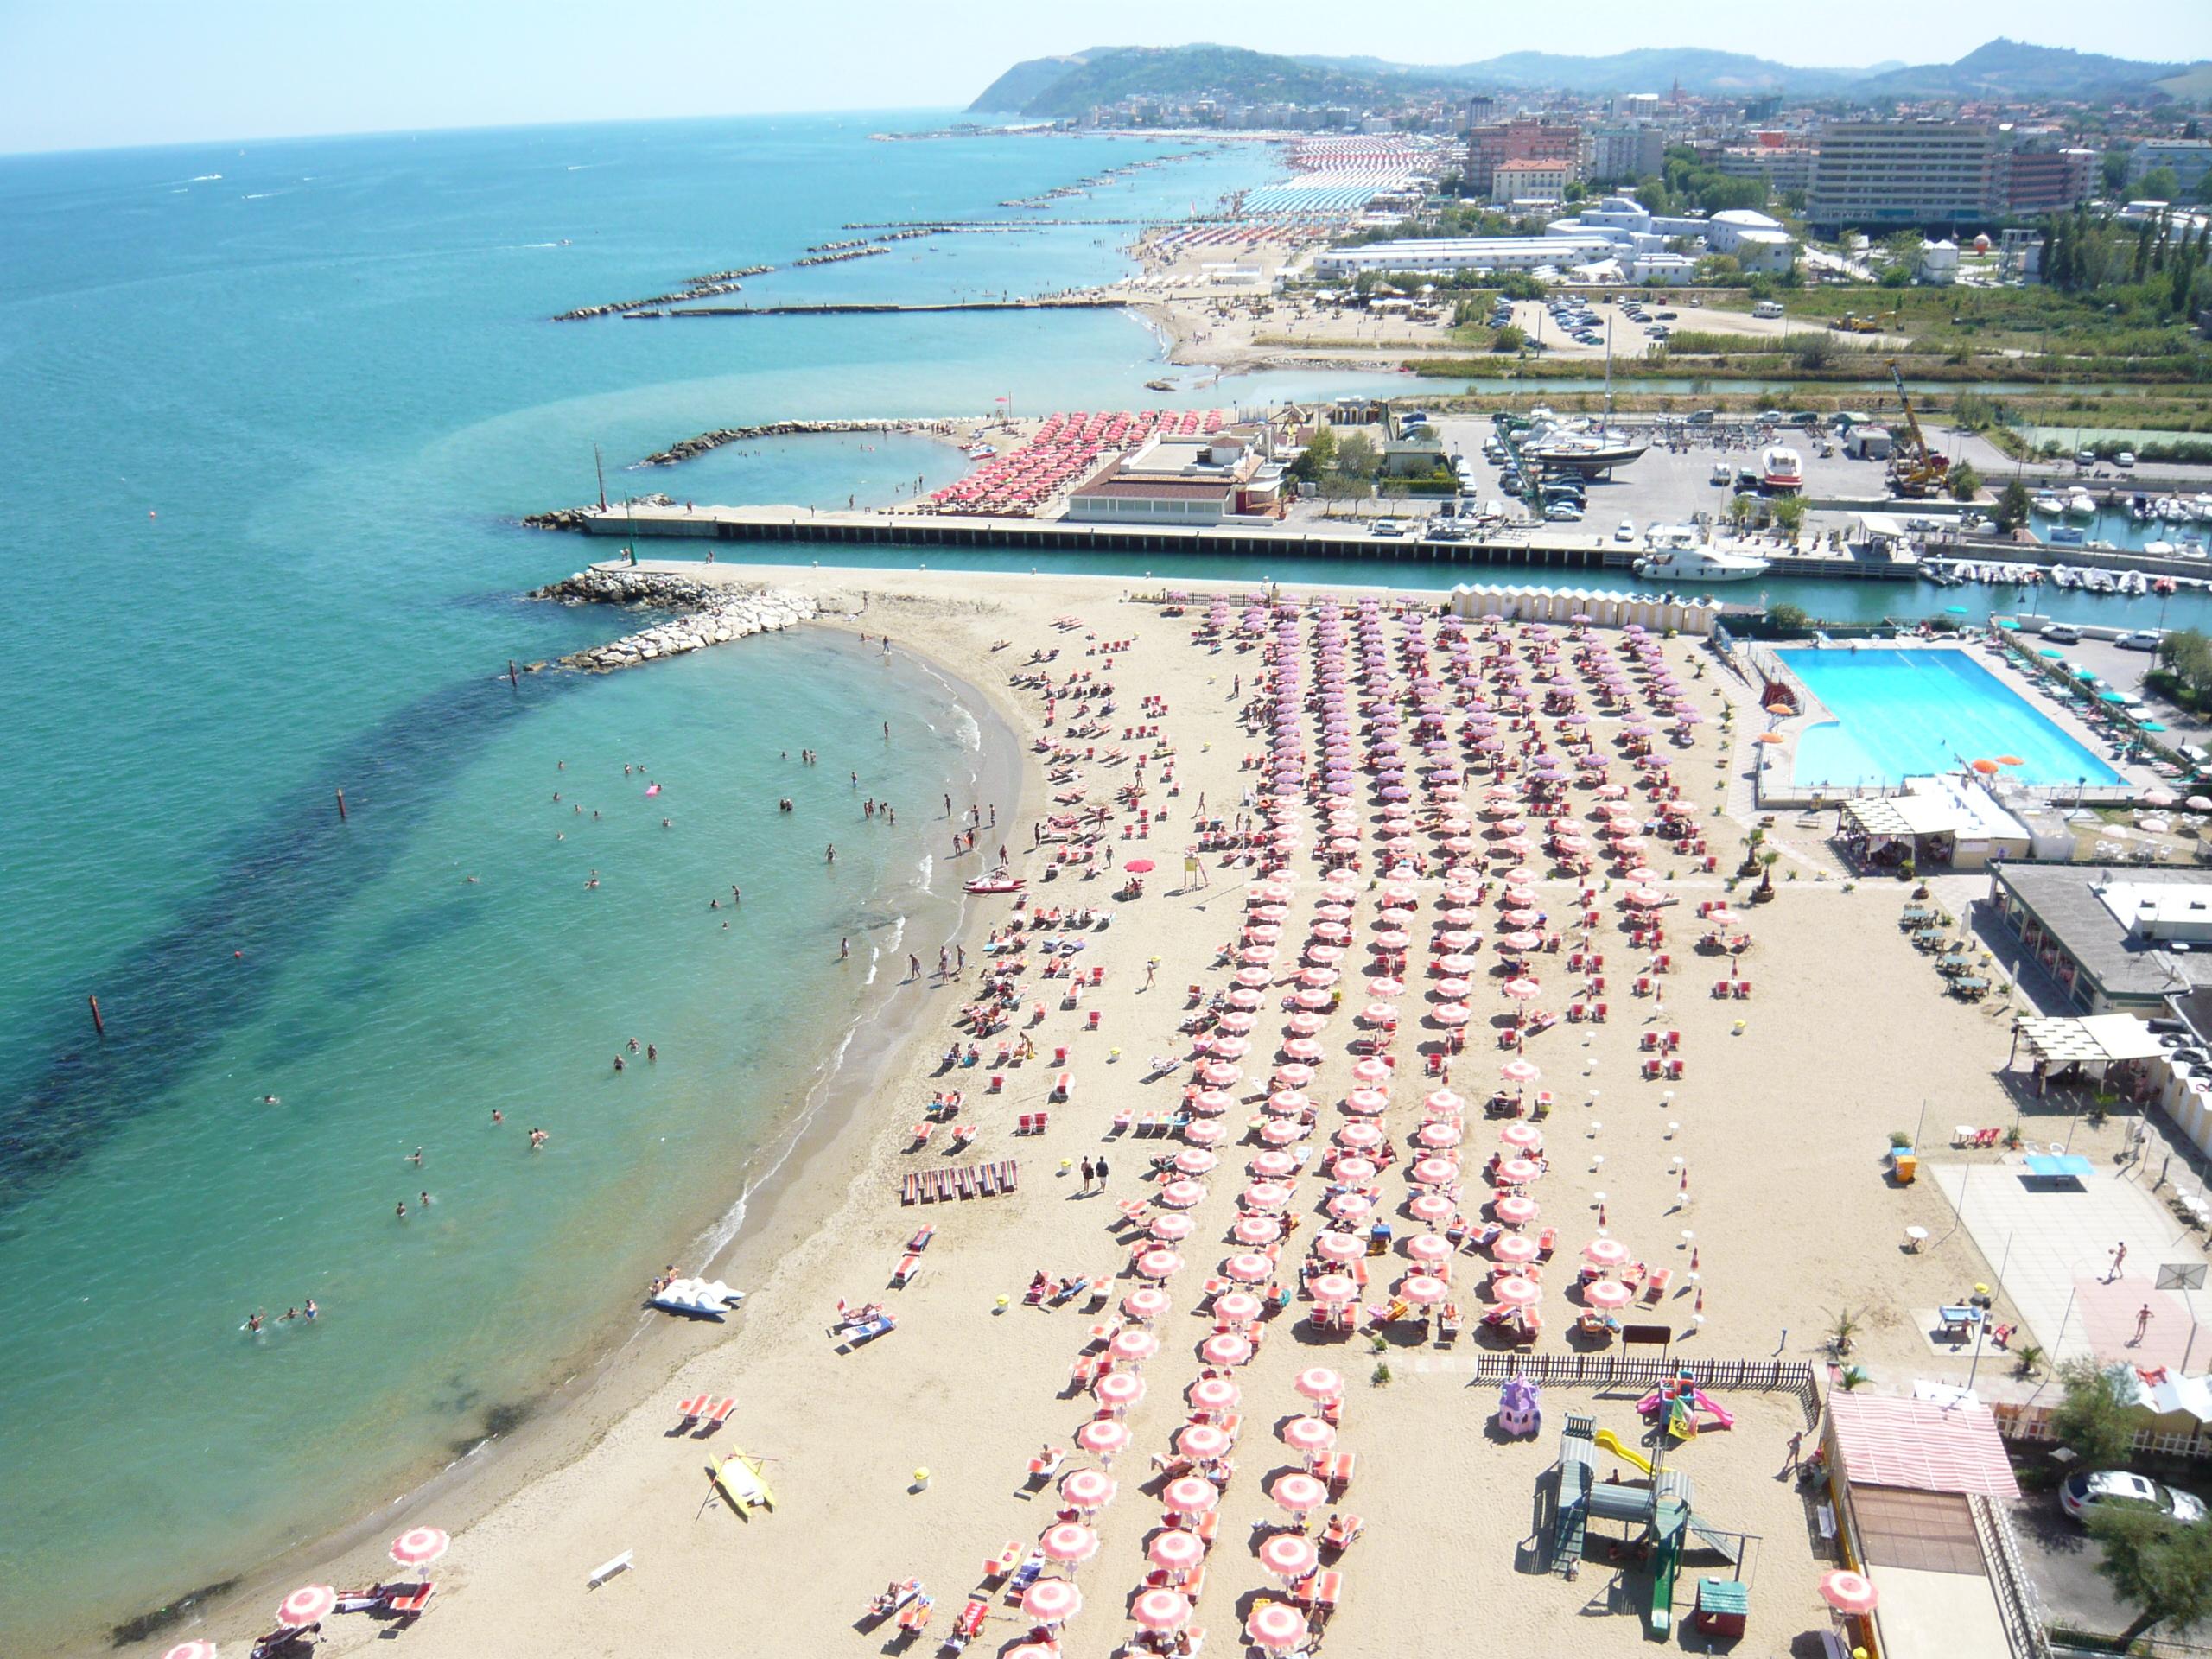 Matrimonio Spiaggia Misano Adriatico : Spiaggia portovede di misano adriatico spiagge italiane